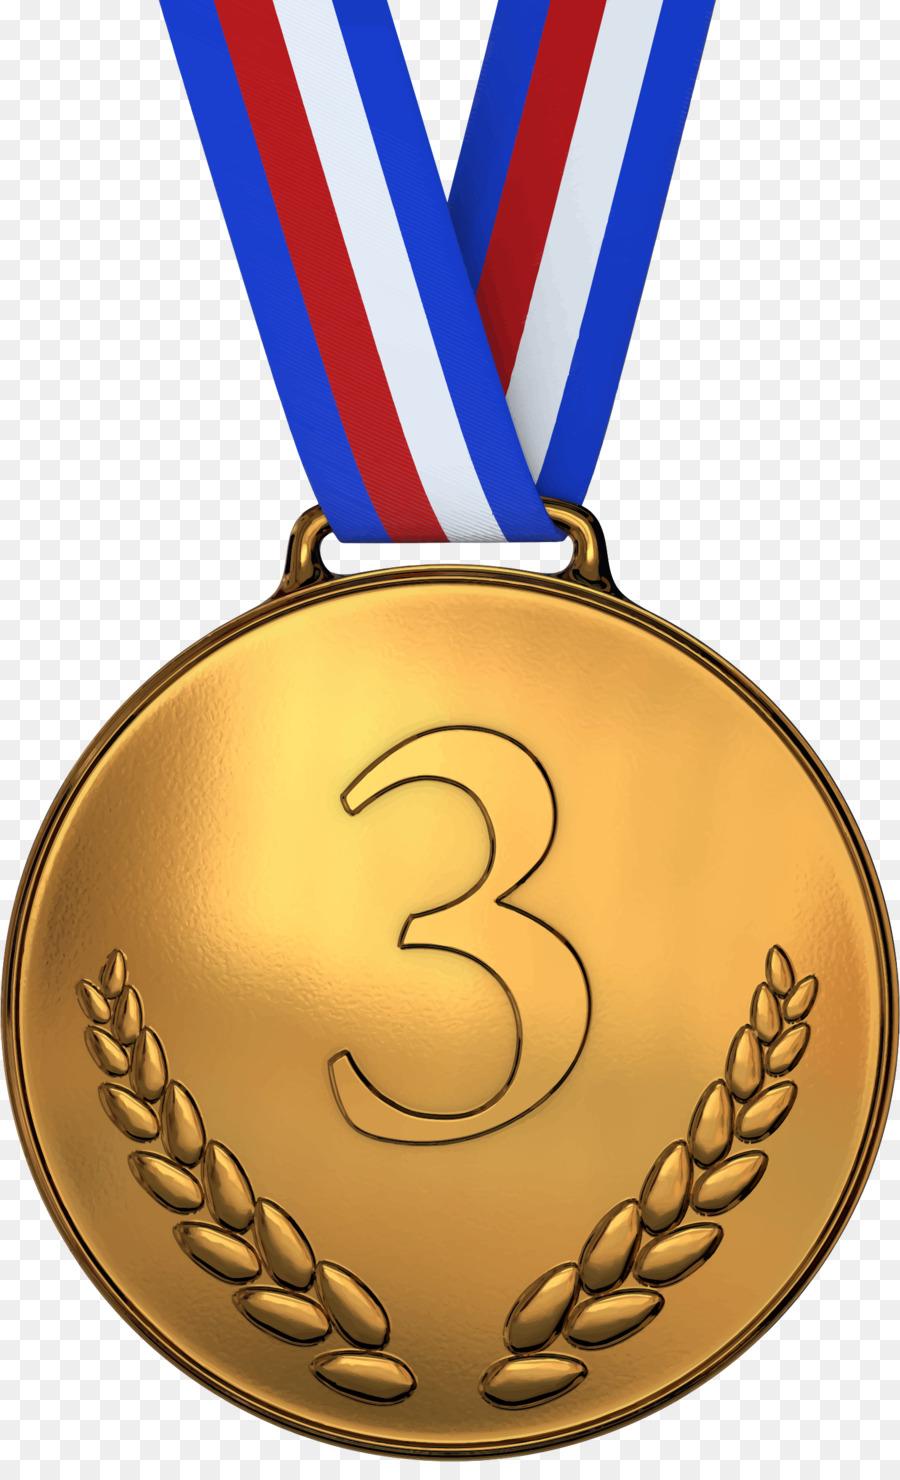 Картинки медалей нарисованы